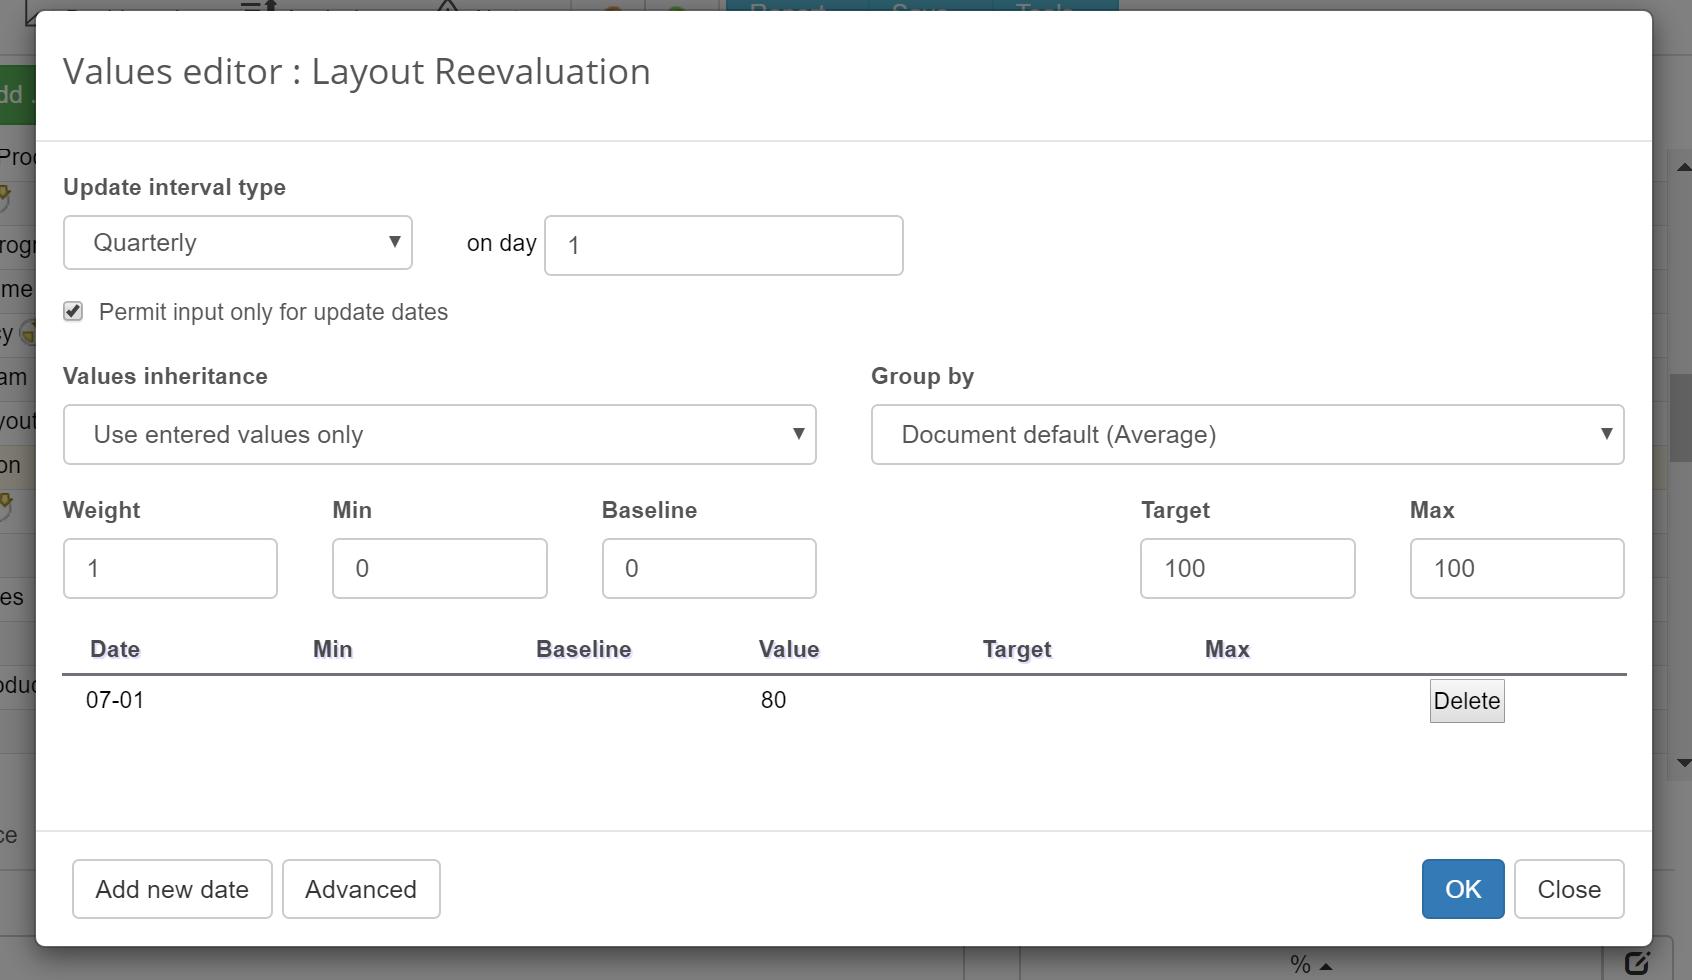 Layout reevaluation KPI setting